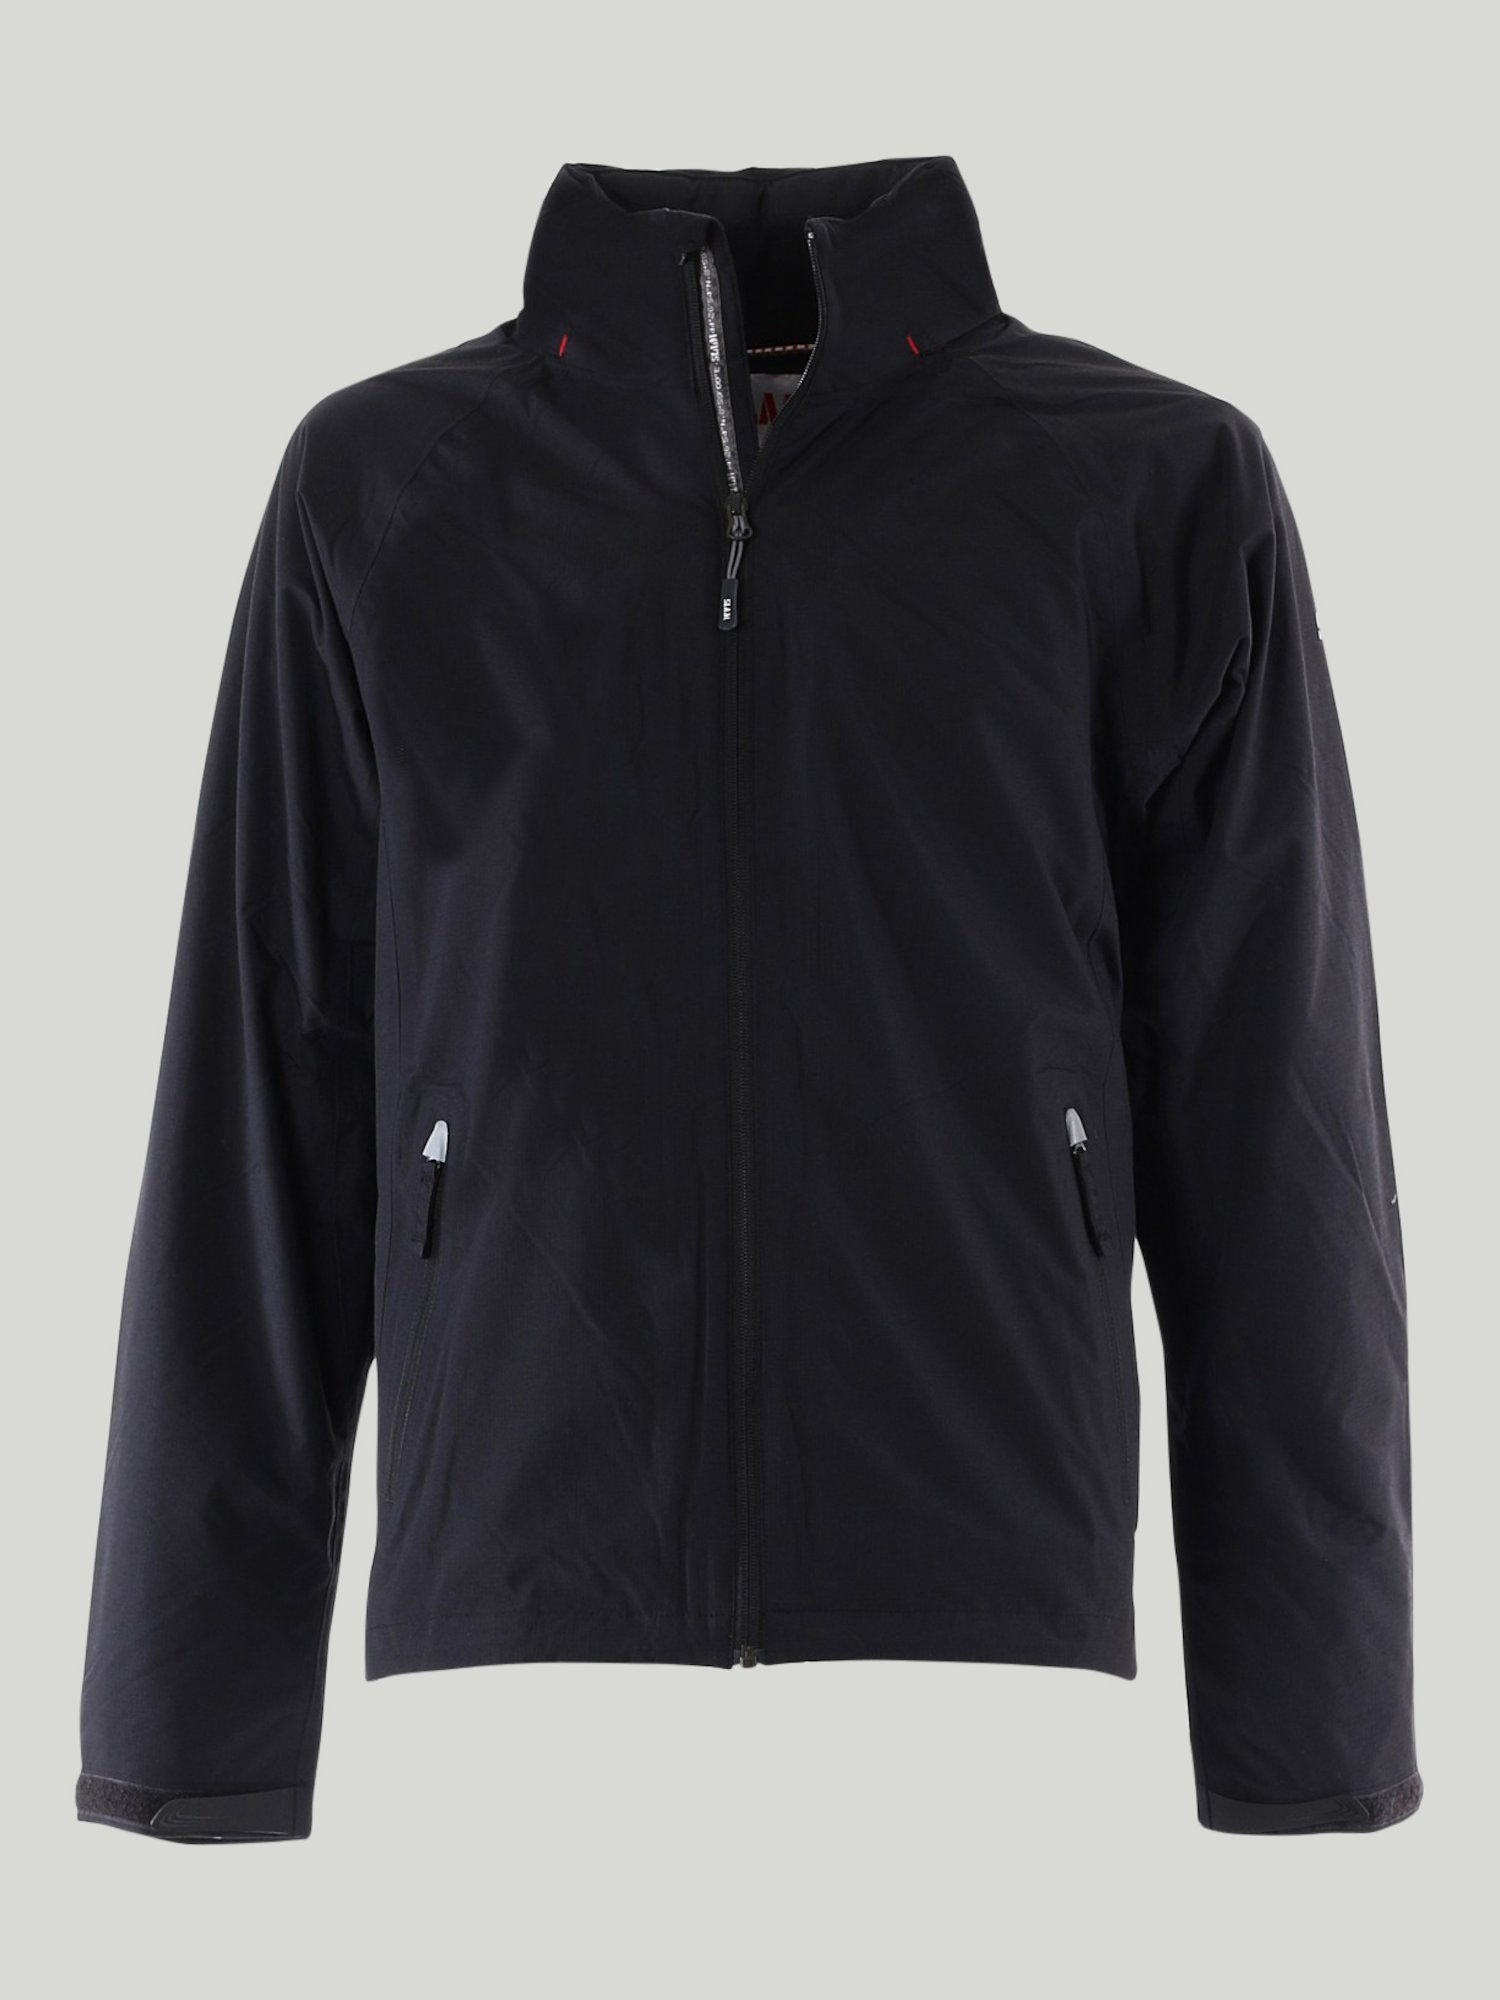 Portocervo jacket - Black